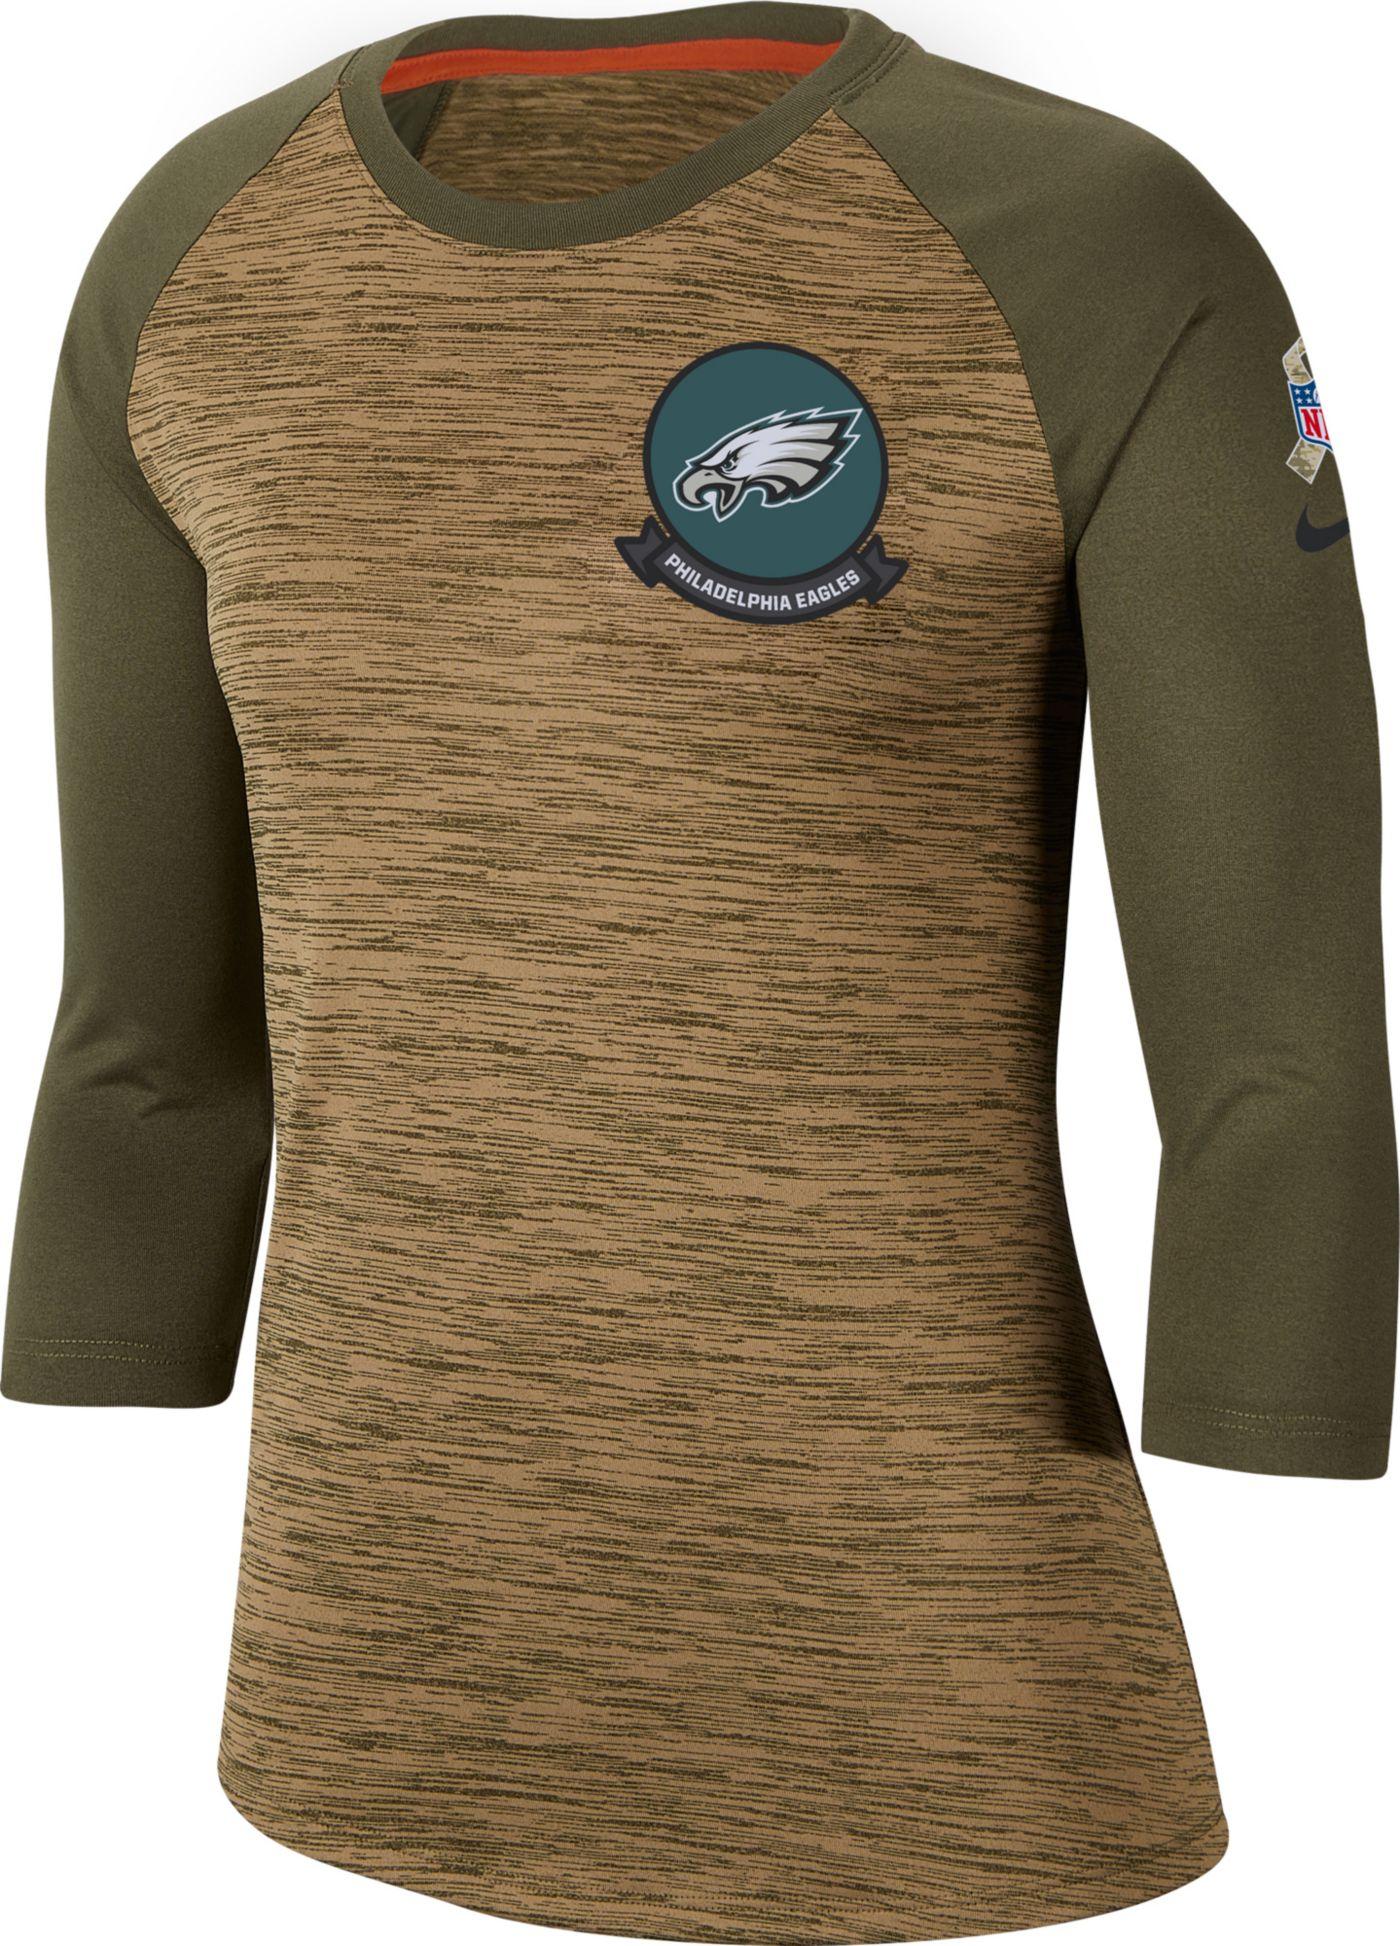 Nike Women's Salute to Service Philadelphia Eagles Dri-FIT Beige Raglan Shirt